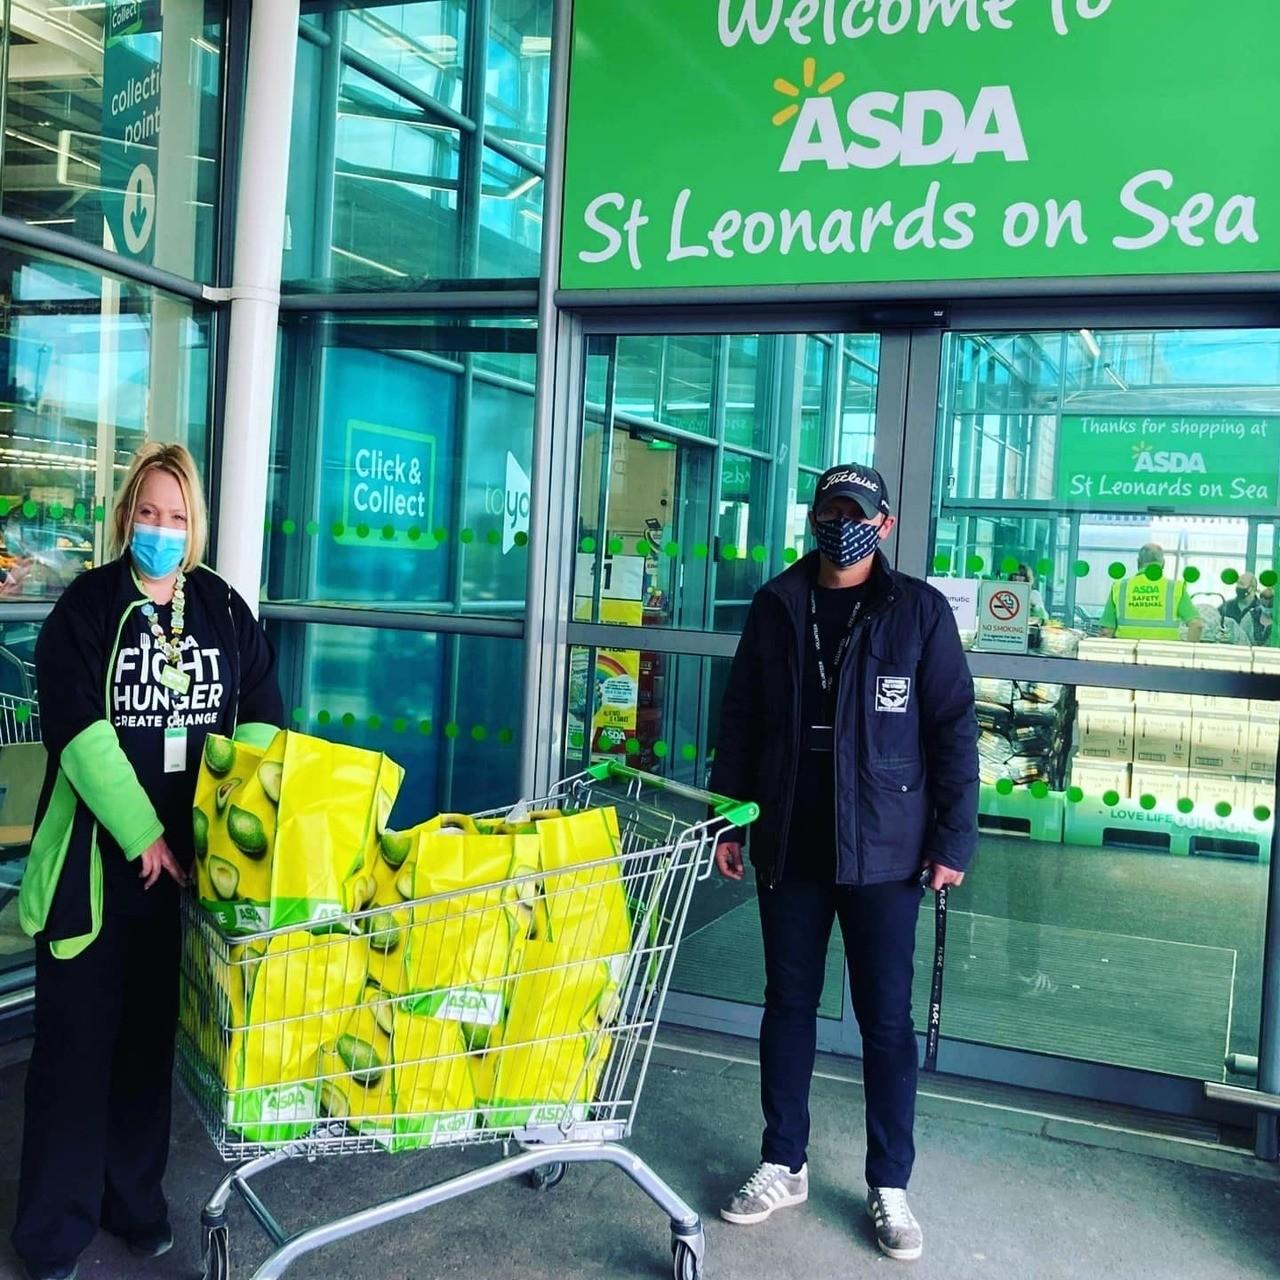 Fighting hunger | Asda St Leonards on Sea